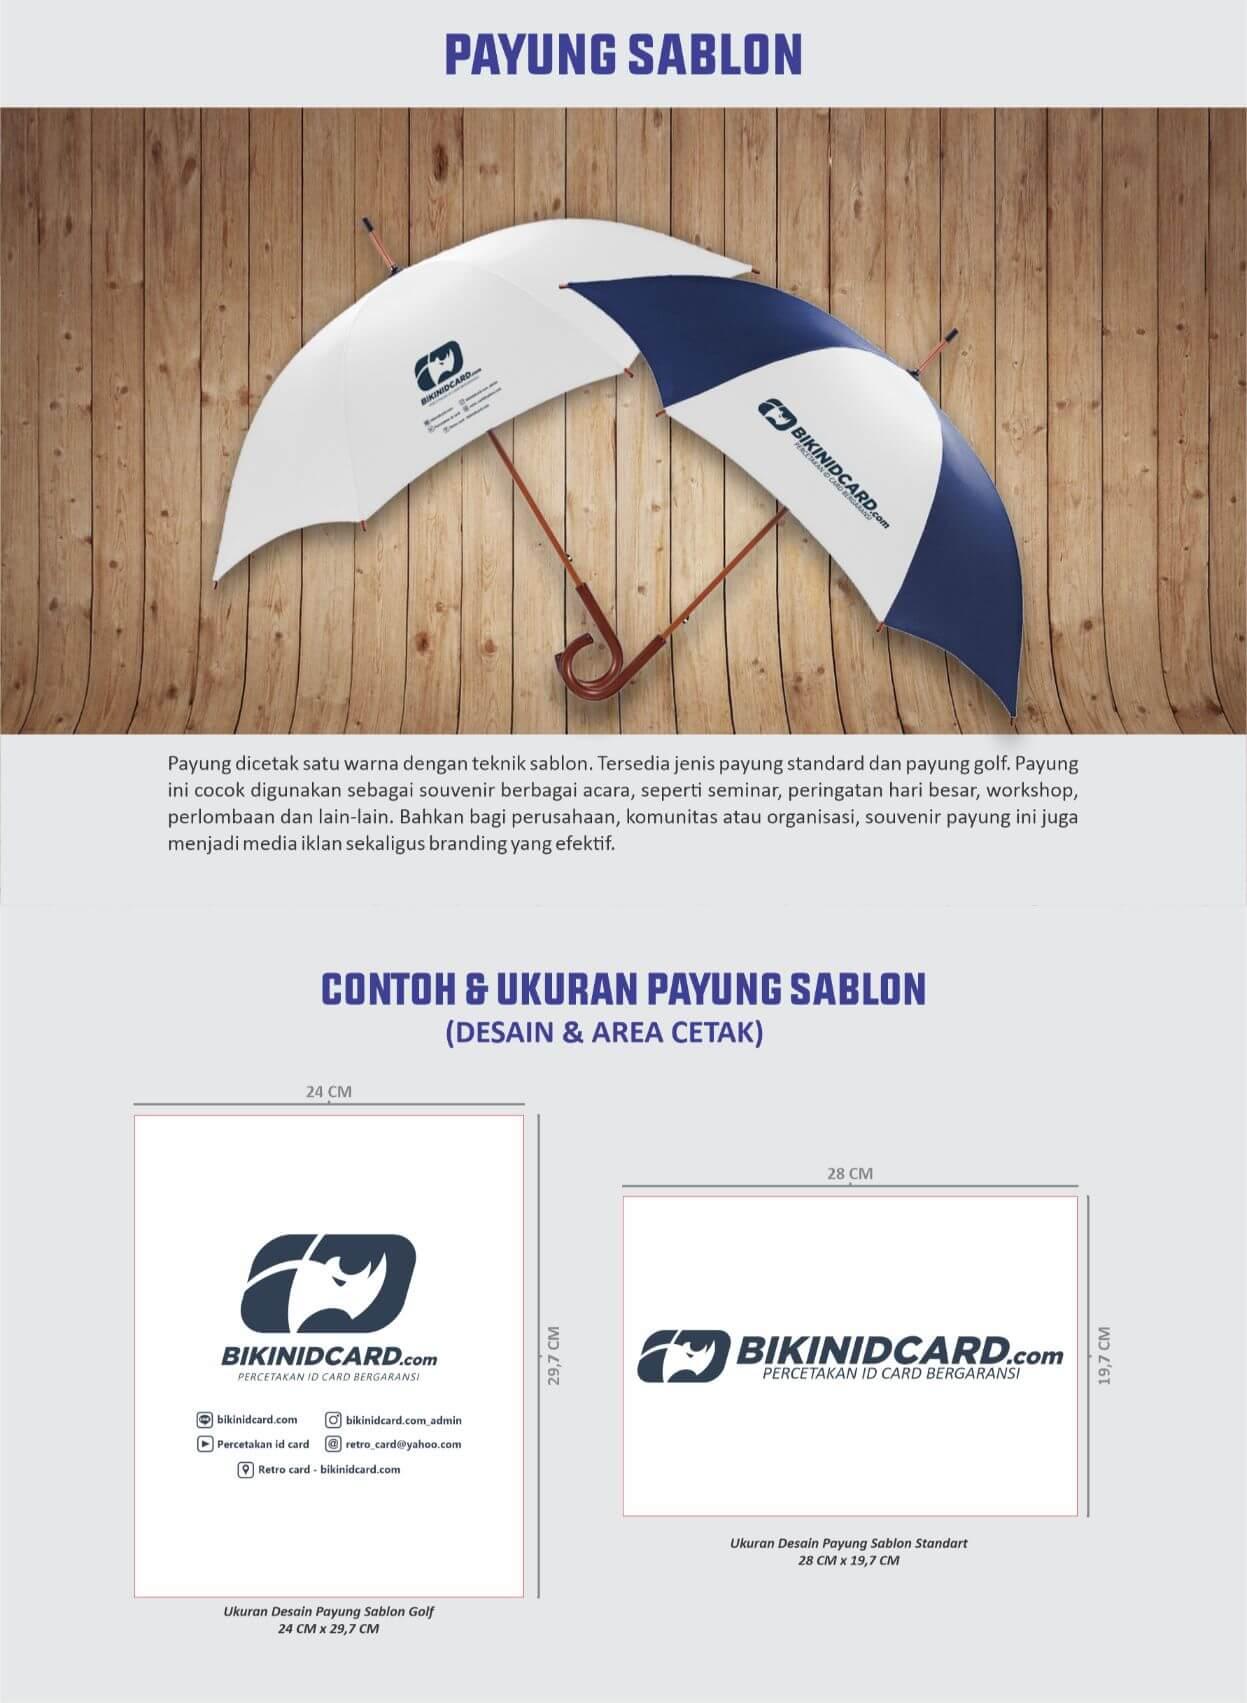 area desain payung sablon